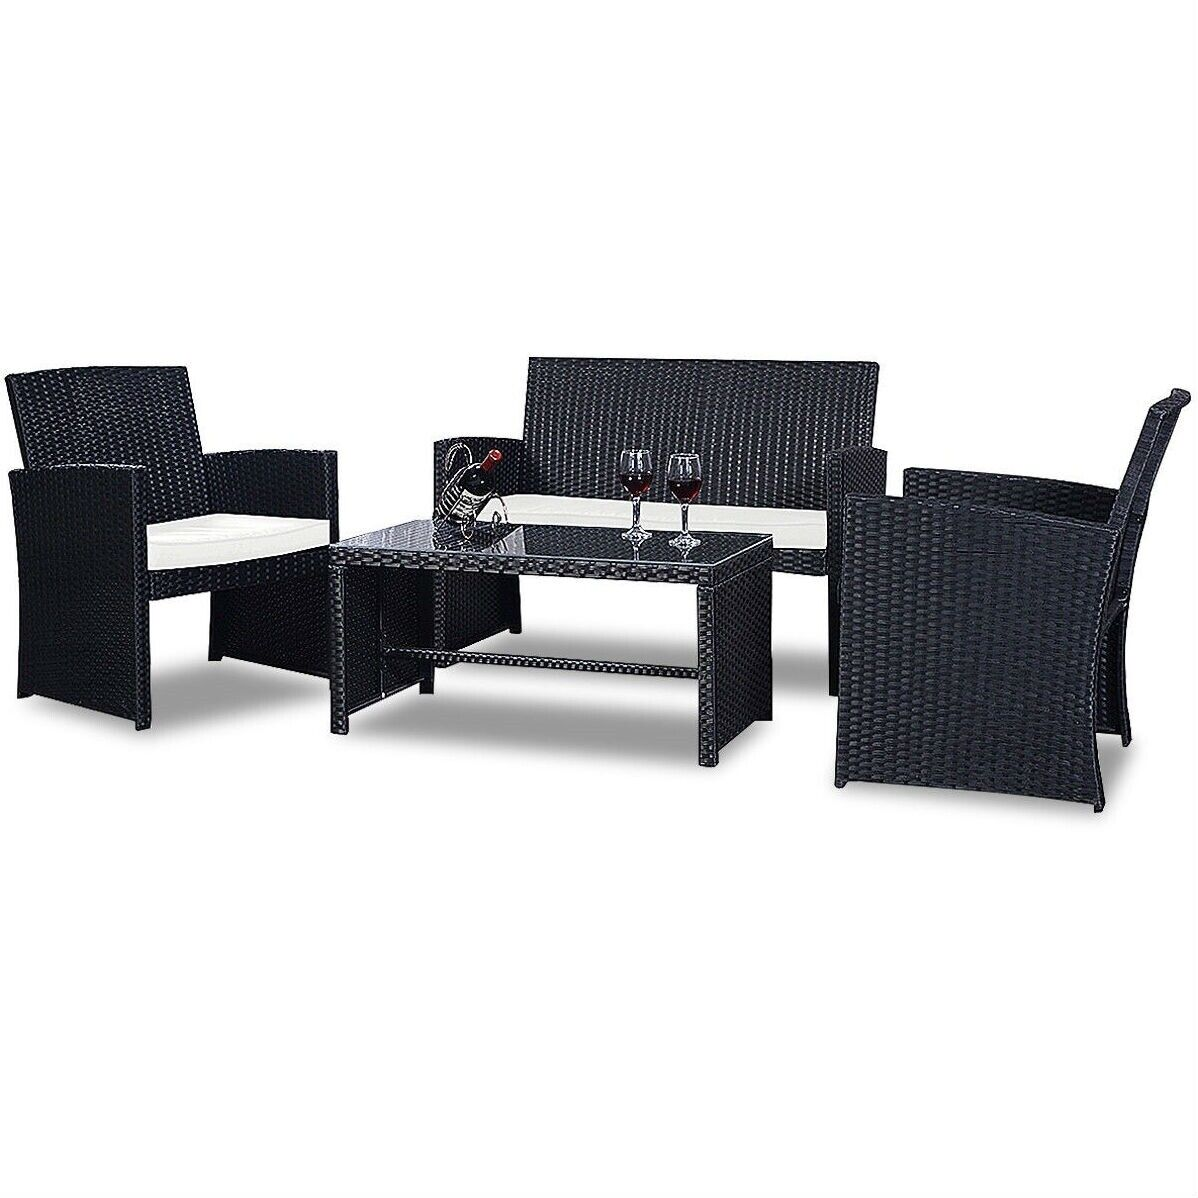 Garden Furniture - PREMIUM NEW GARDEN RATTAN FURNITURE SET 4 PIECE CHAIRS SOFA TABLE OUTDOOR PATIO